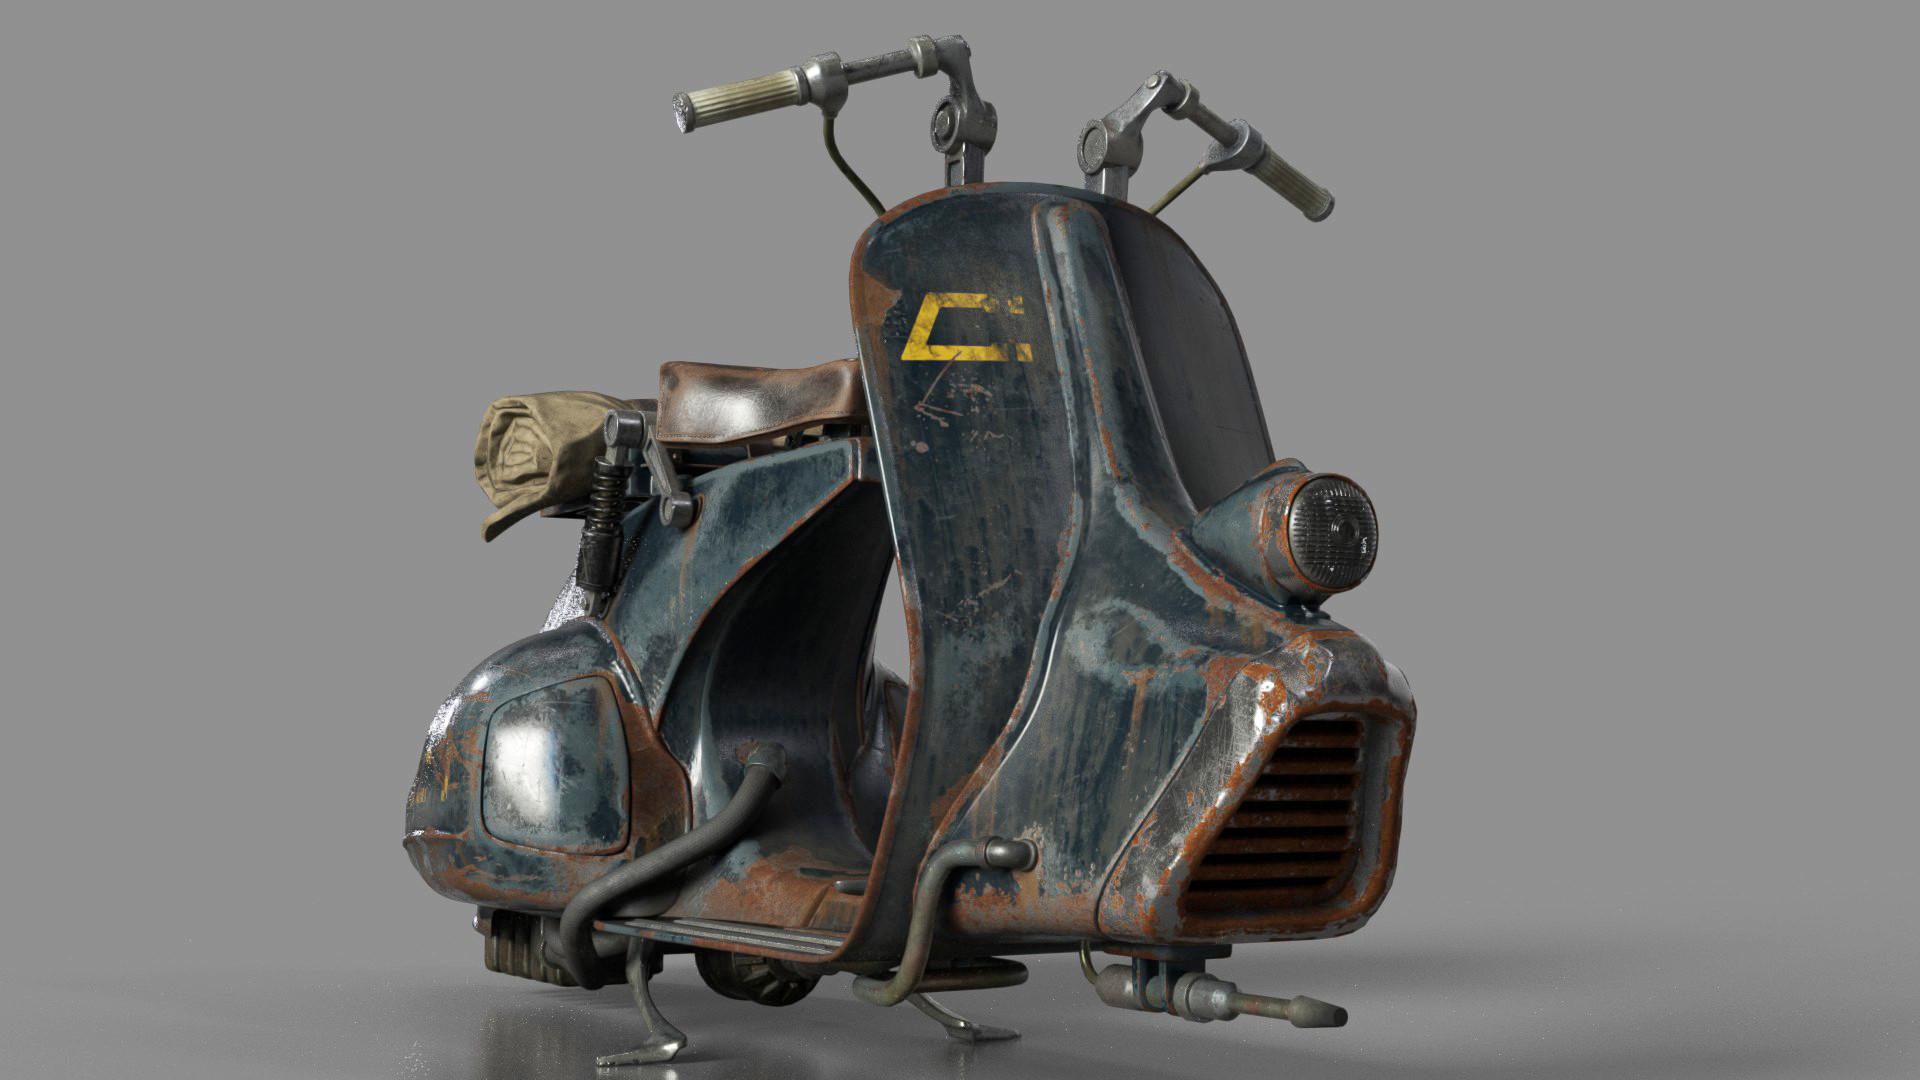 Ricki Martin Vintage Vespa Speeder Bike